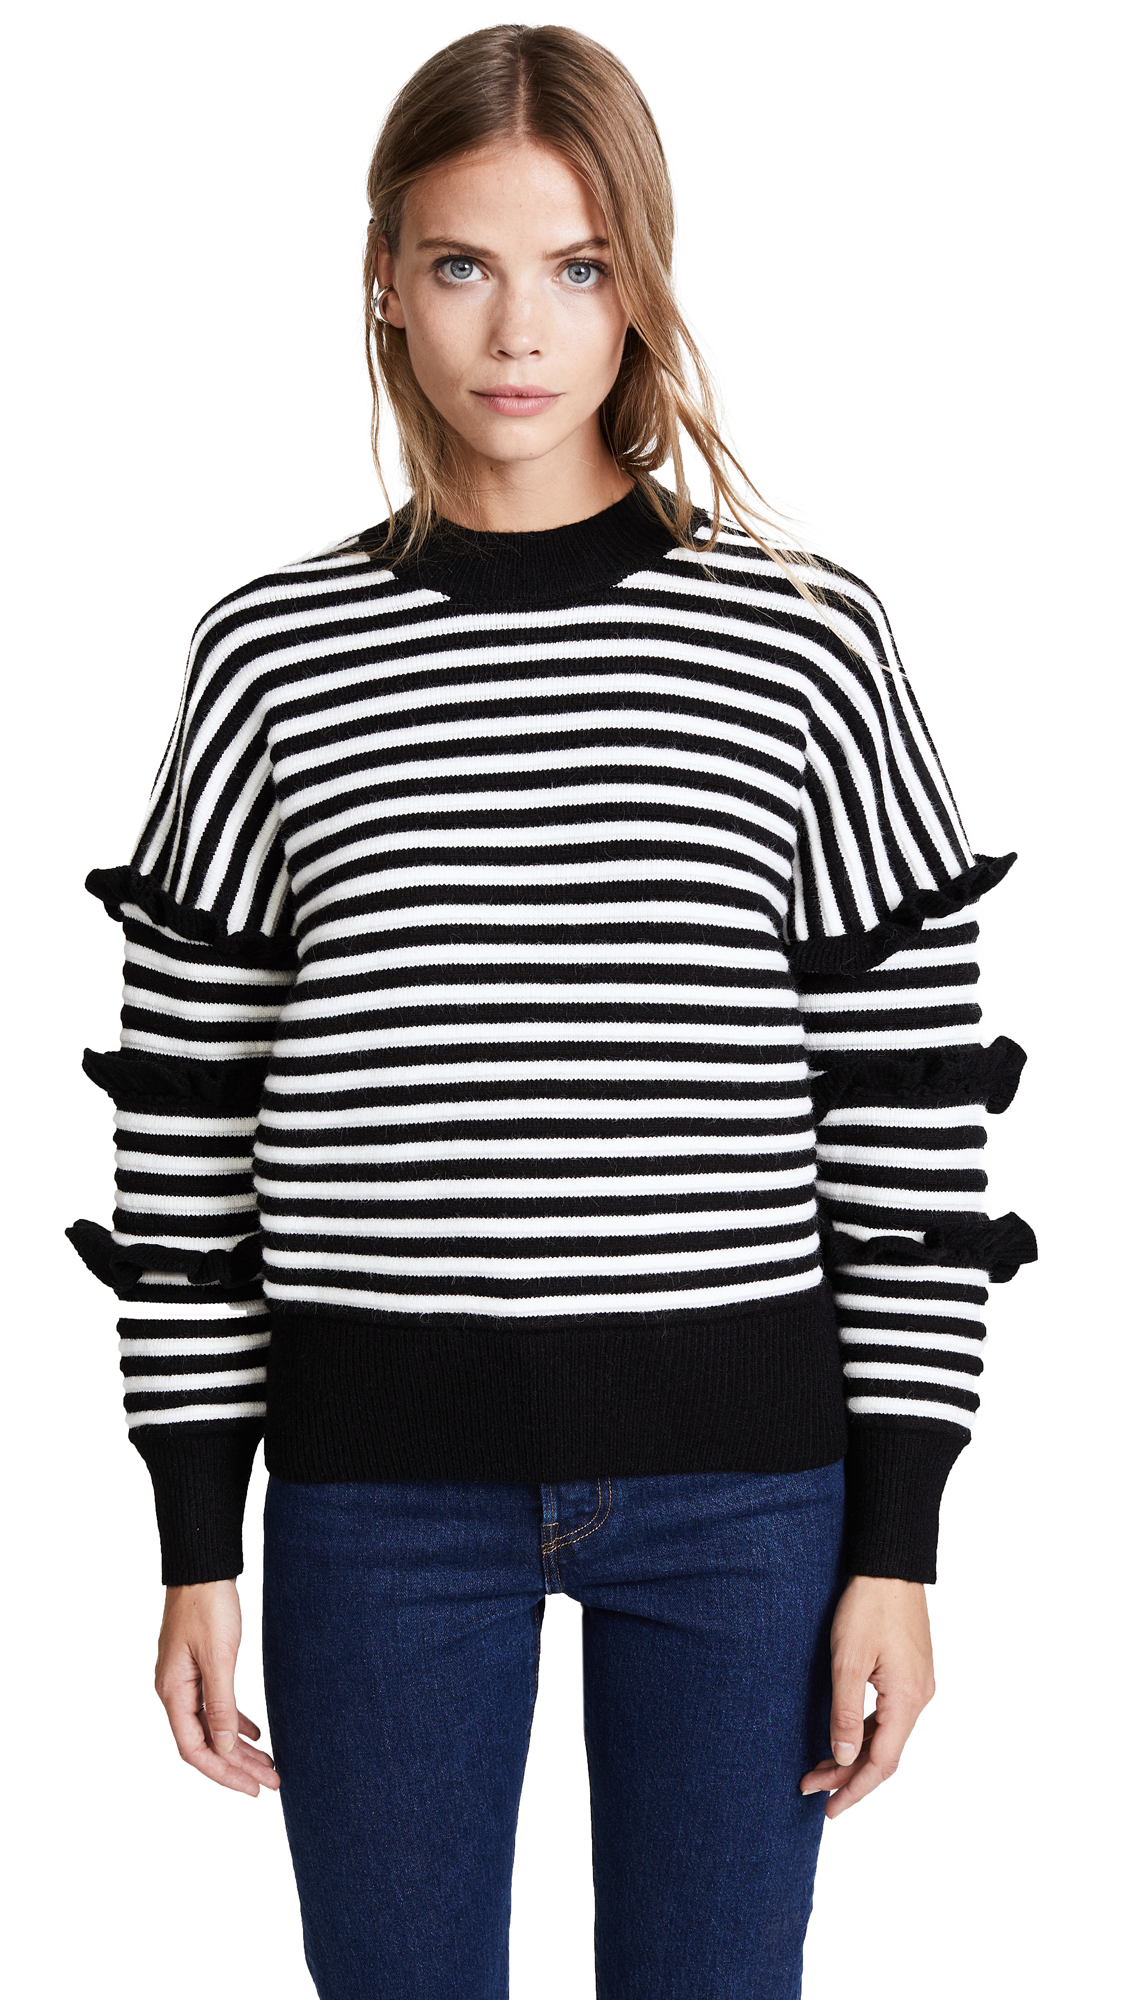 ENGLISH FACTORY Stripe Ruffle Sweater - Black